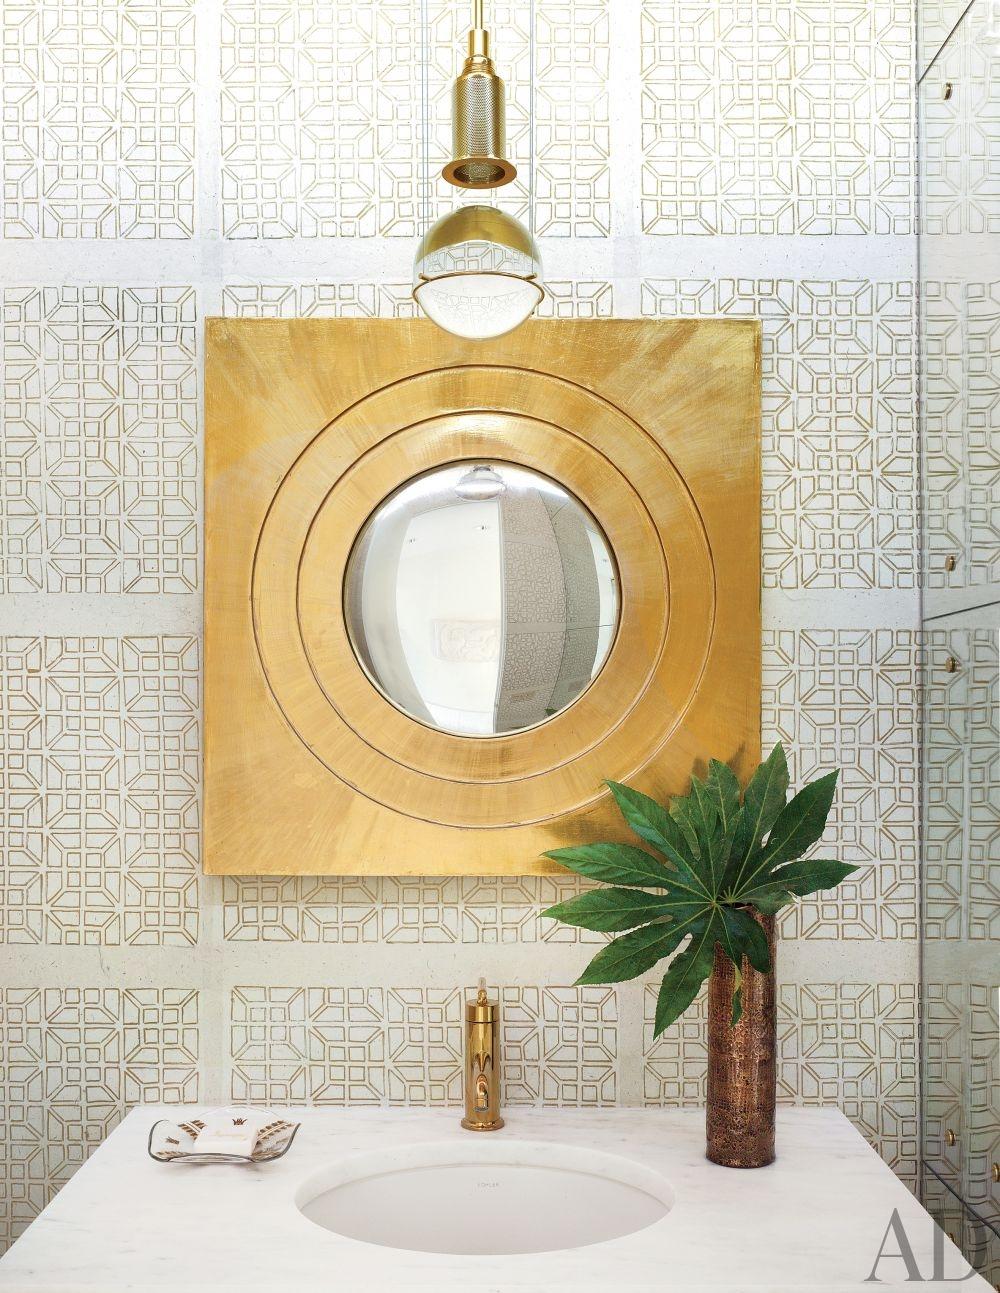 modern-bathroom-emily-summers-design-associates-indian-wells-california-201204_1000-watermarked.jpg